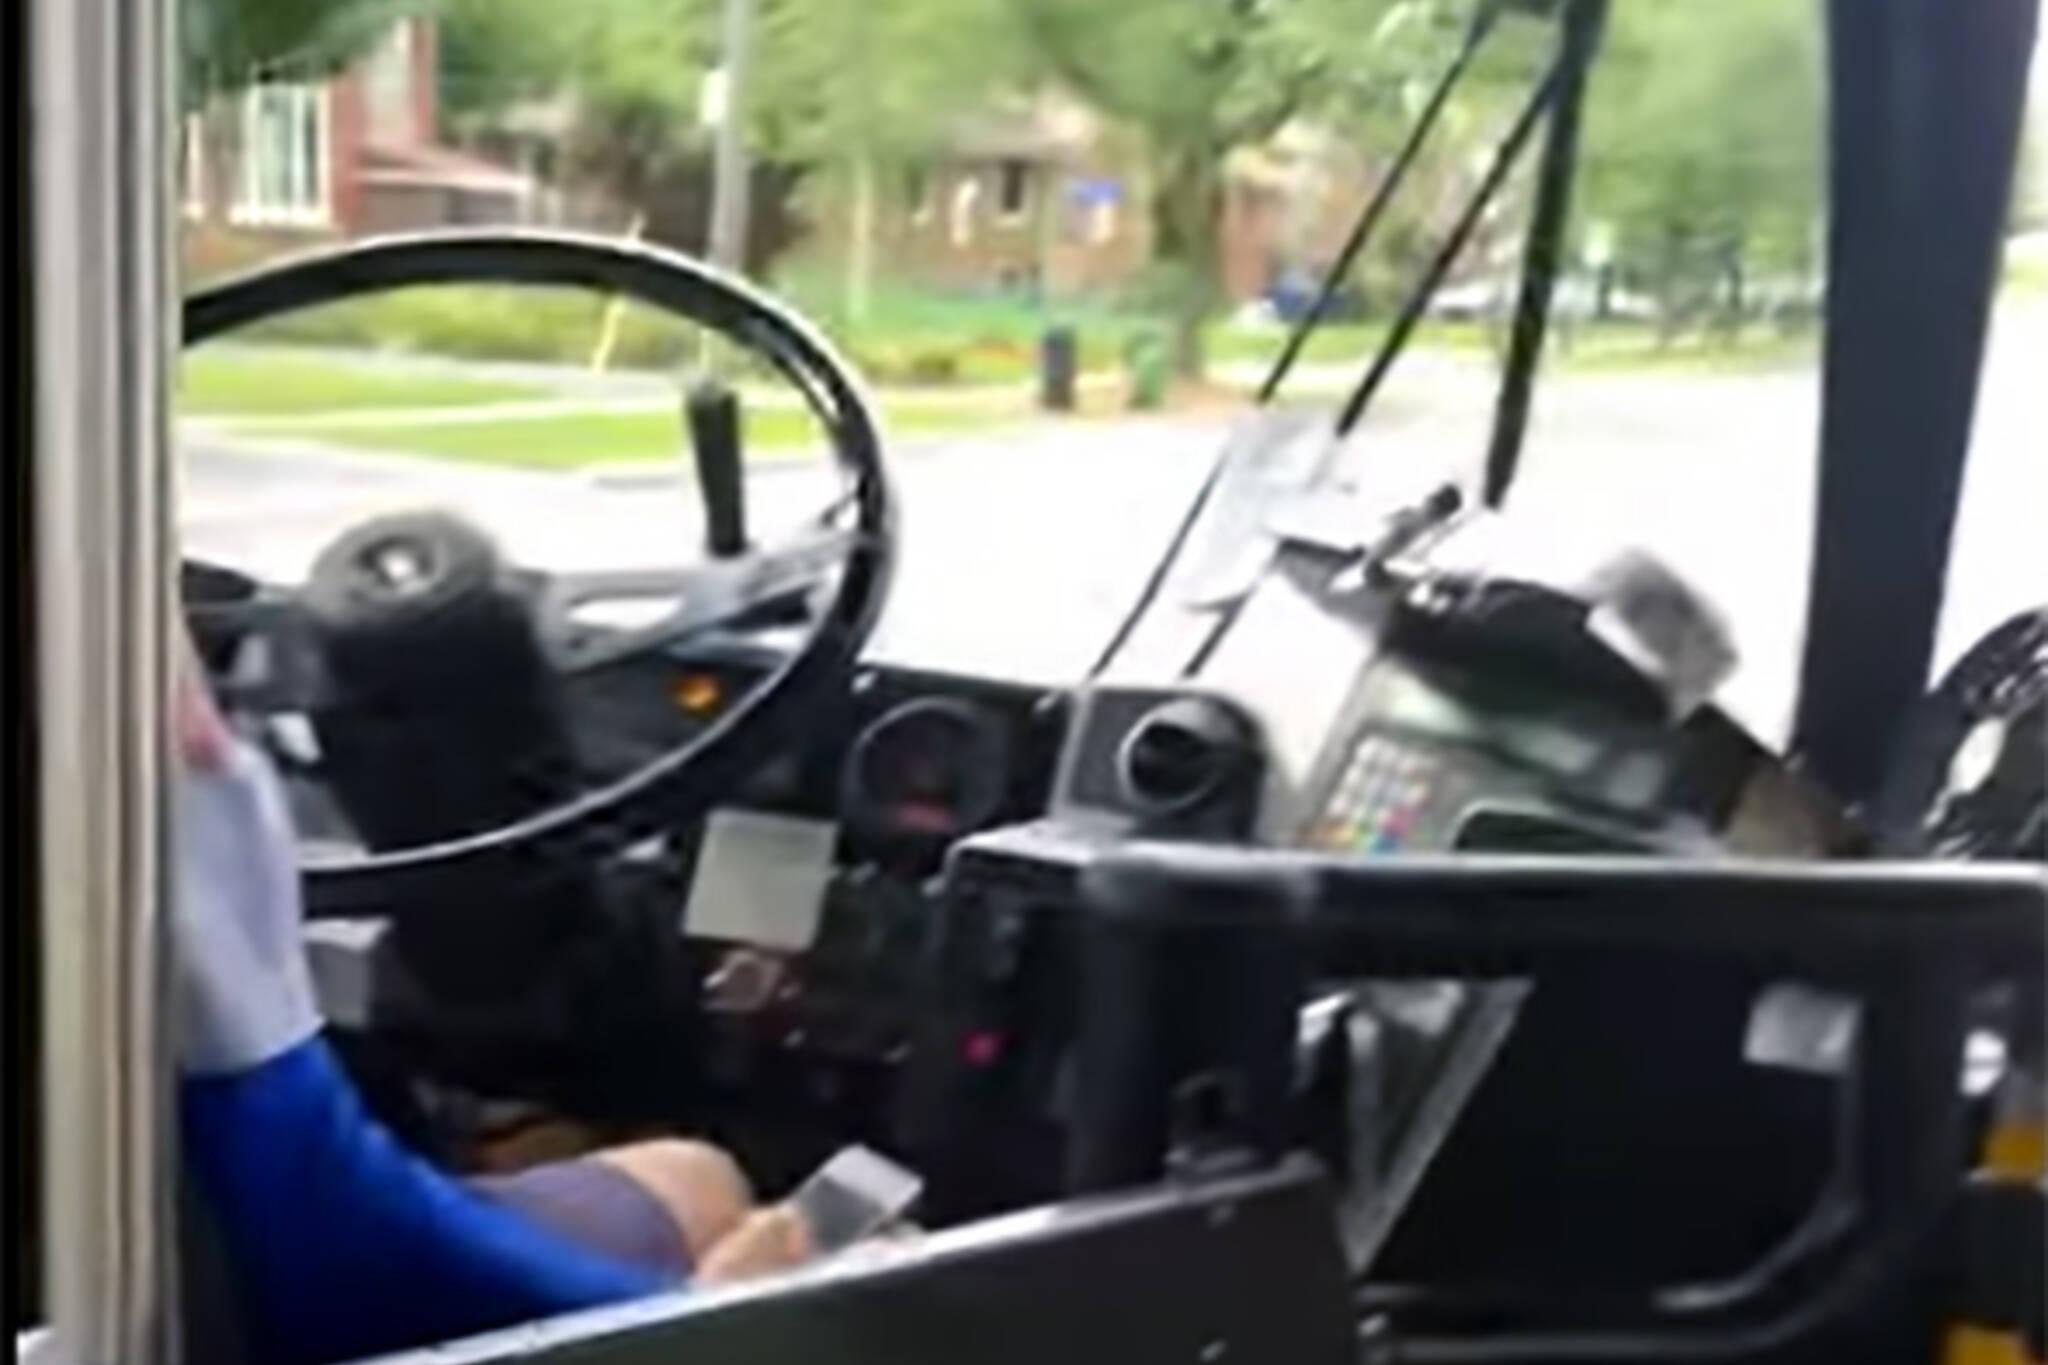 ttc driver texting video